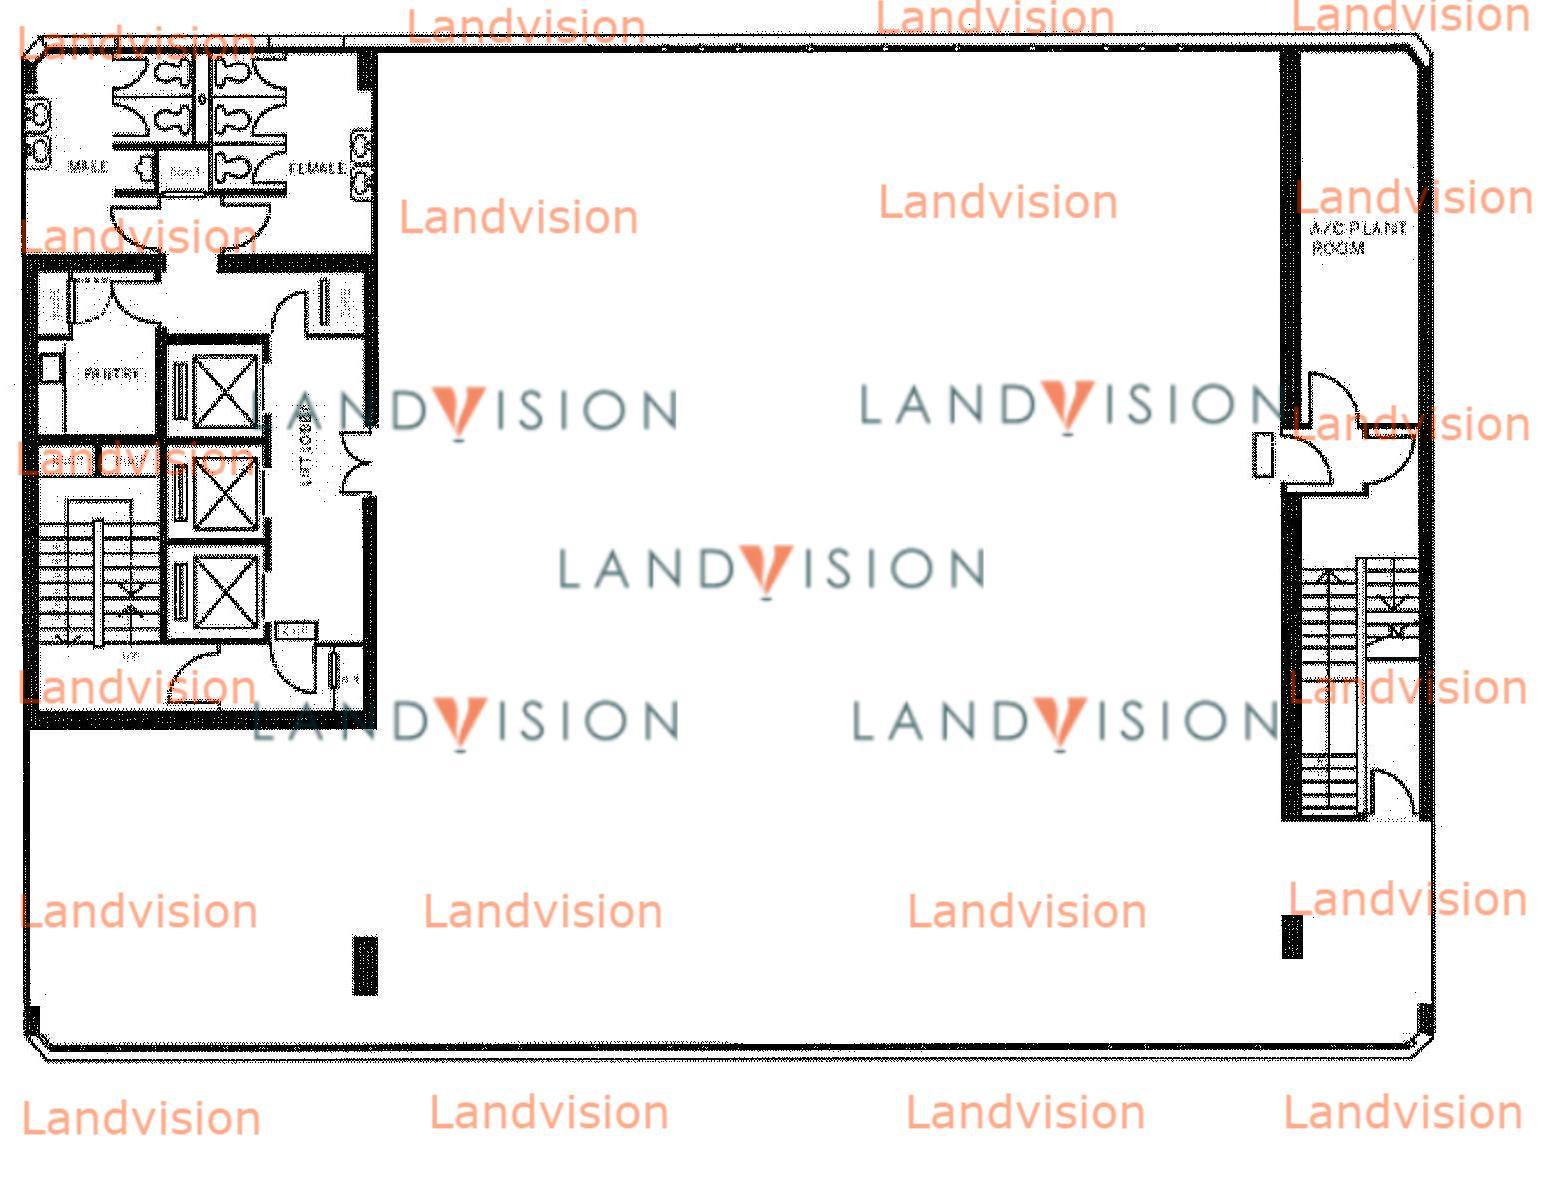 https://www.landvision.com.hk/wp-content/uploads/website/resize/floorplans/000141.JPG